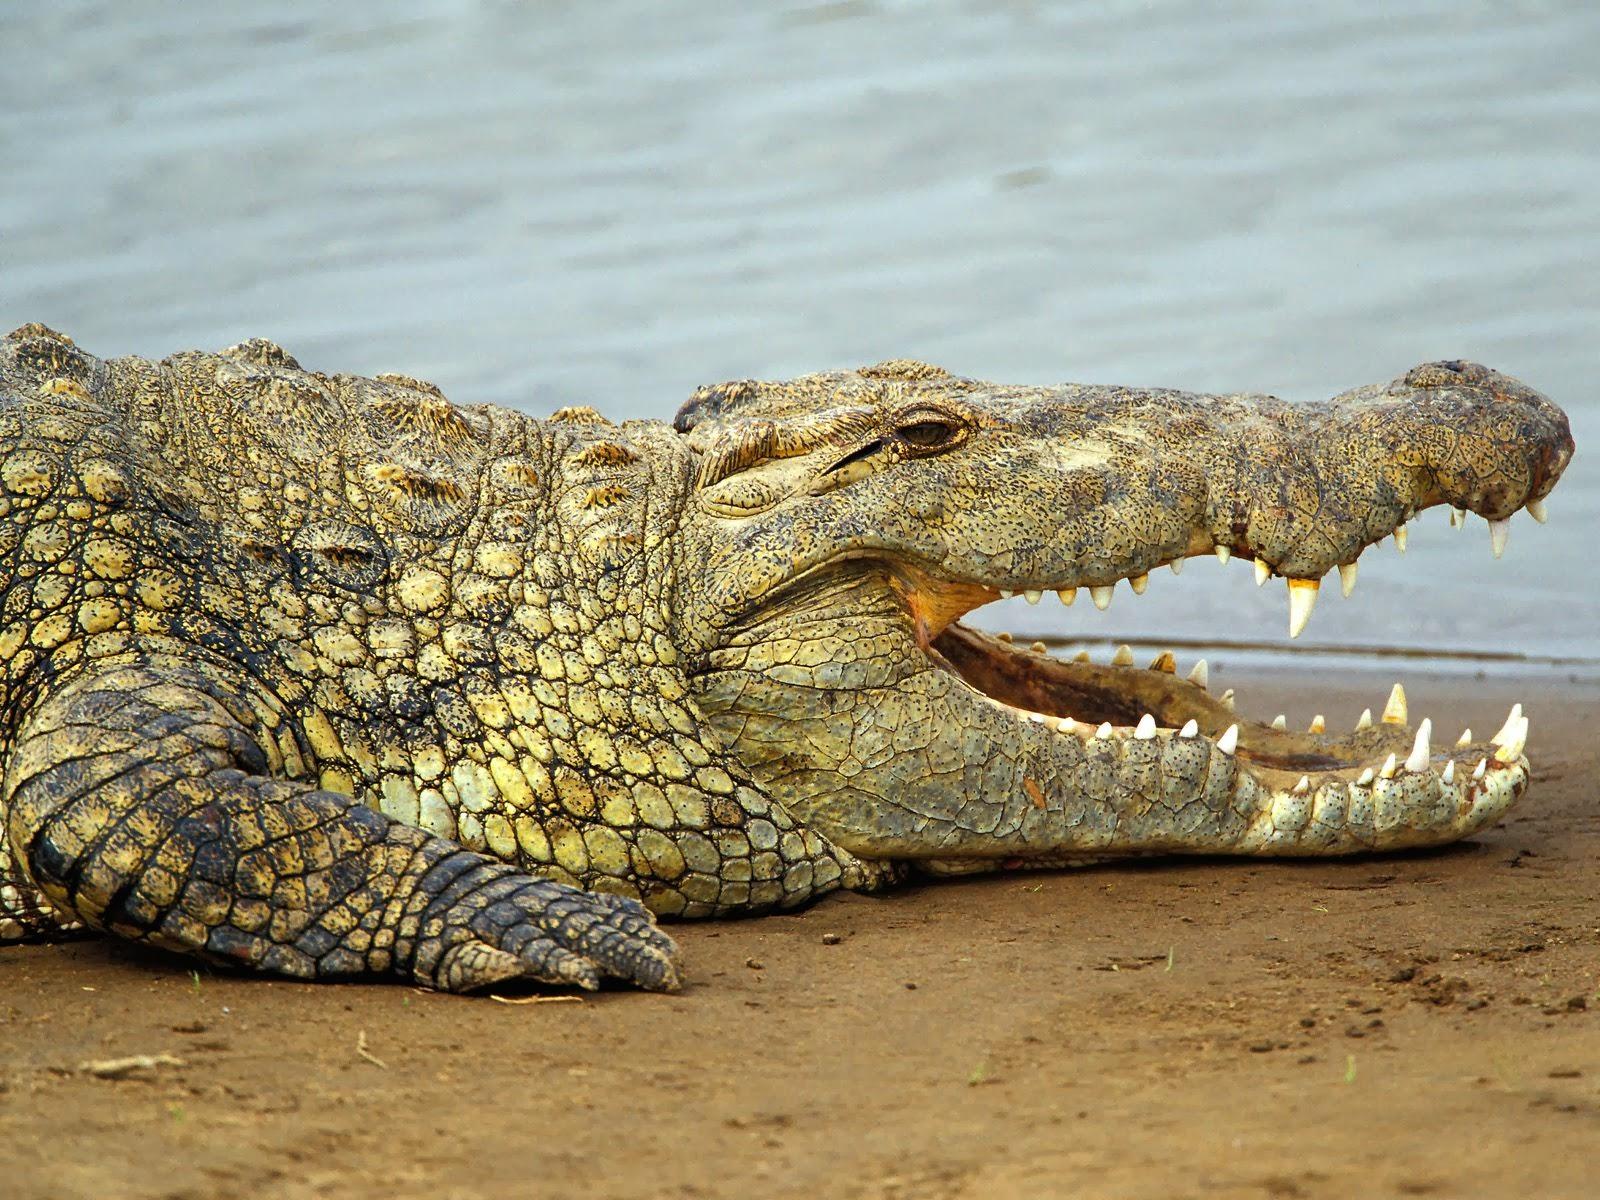 Crocodile Images